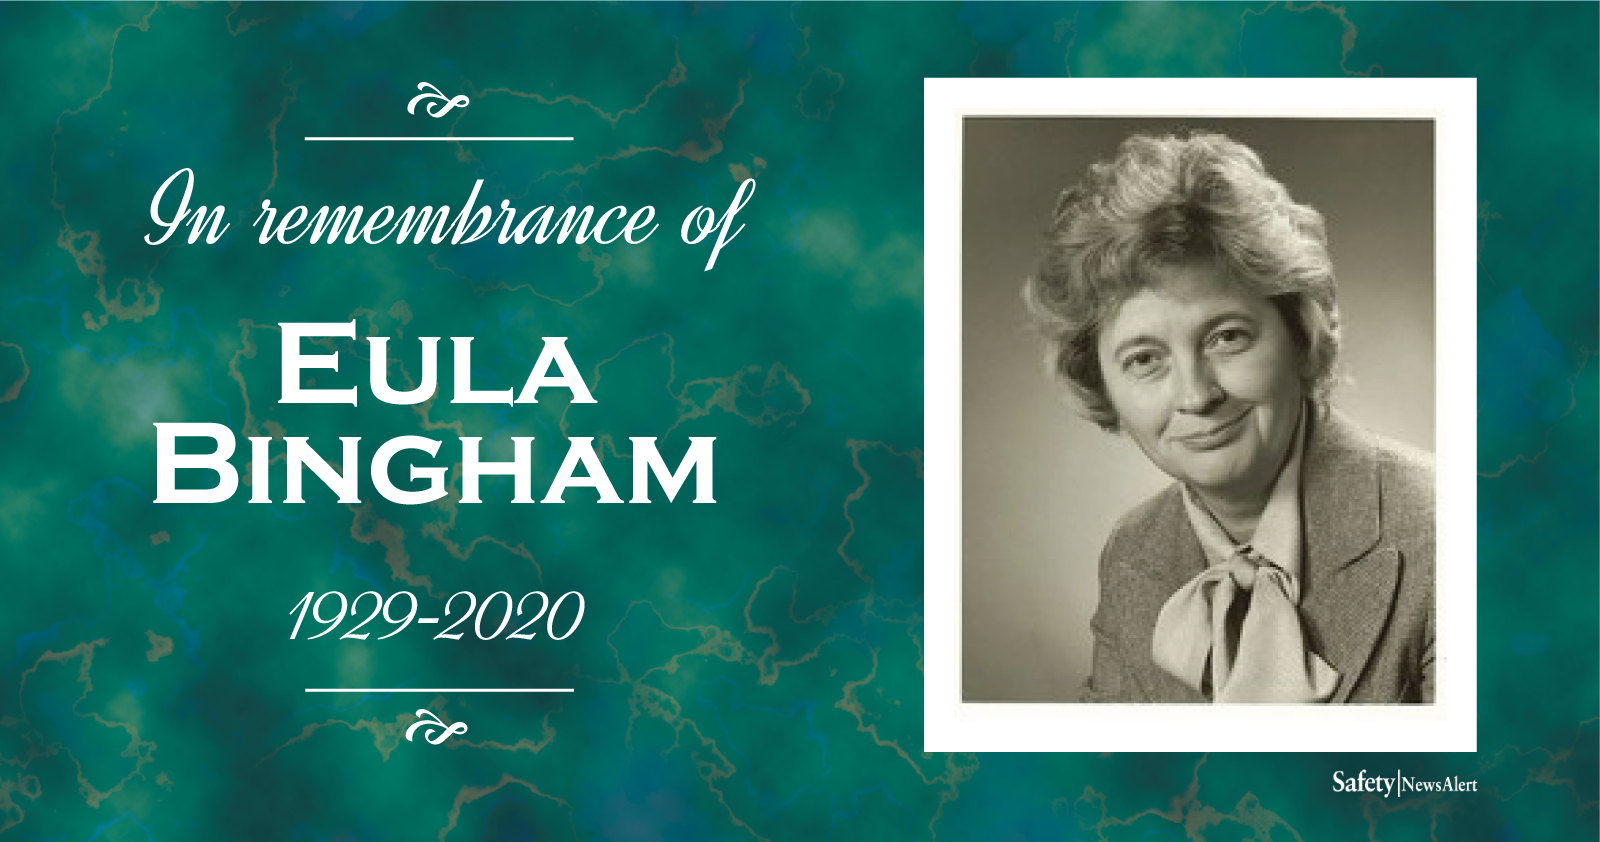 Eula Bingham remembrance